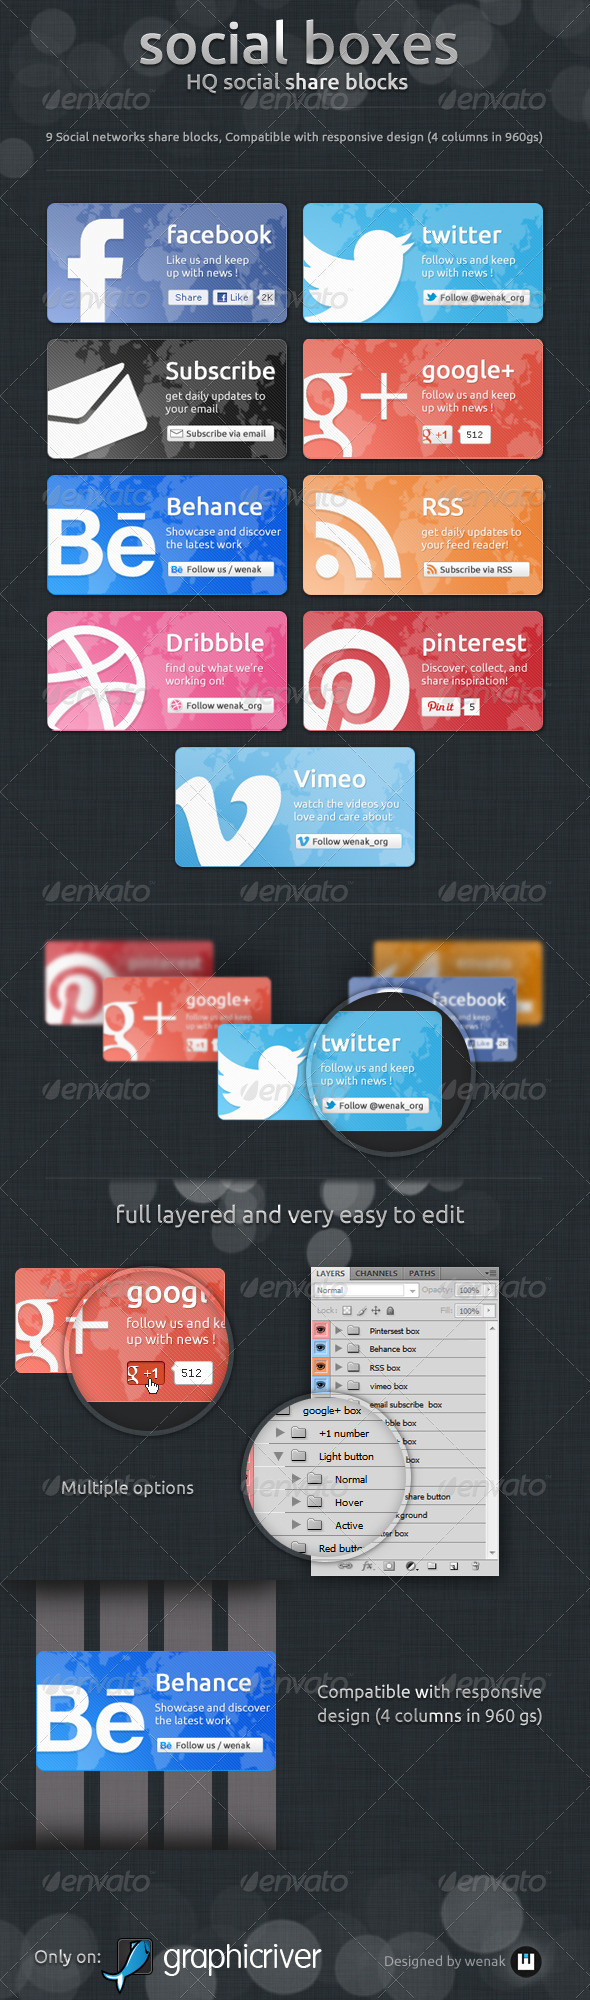 GraphicRiver Social Boxes Social Share Blocks 3846042